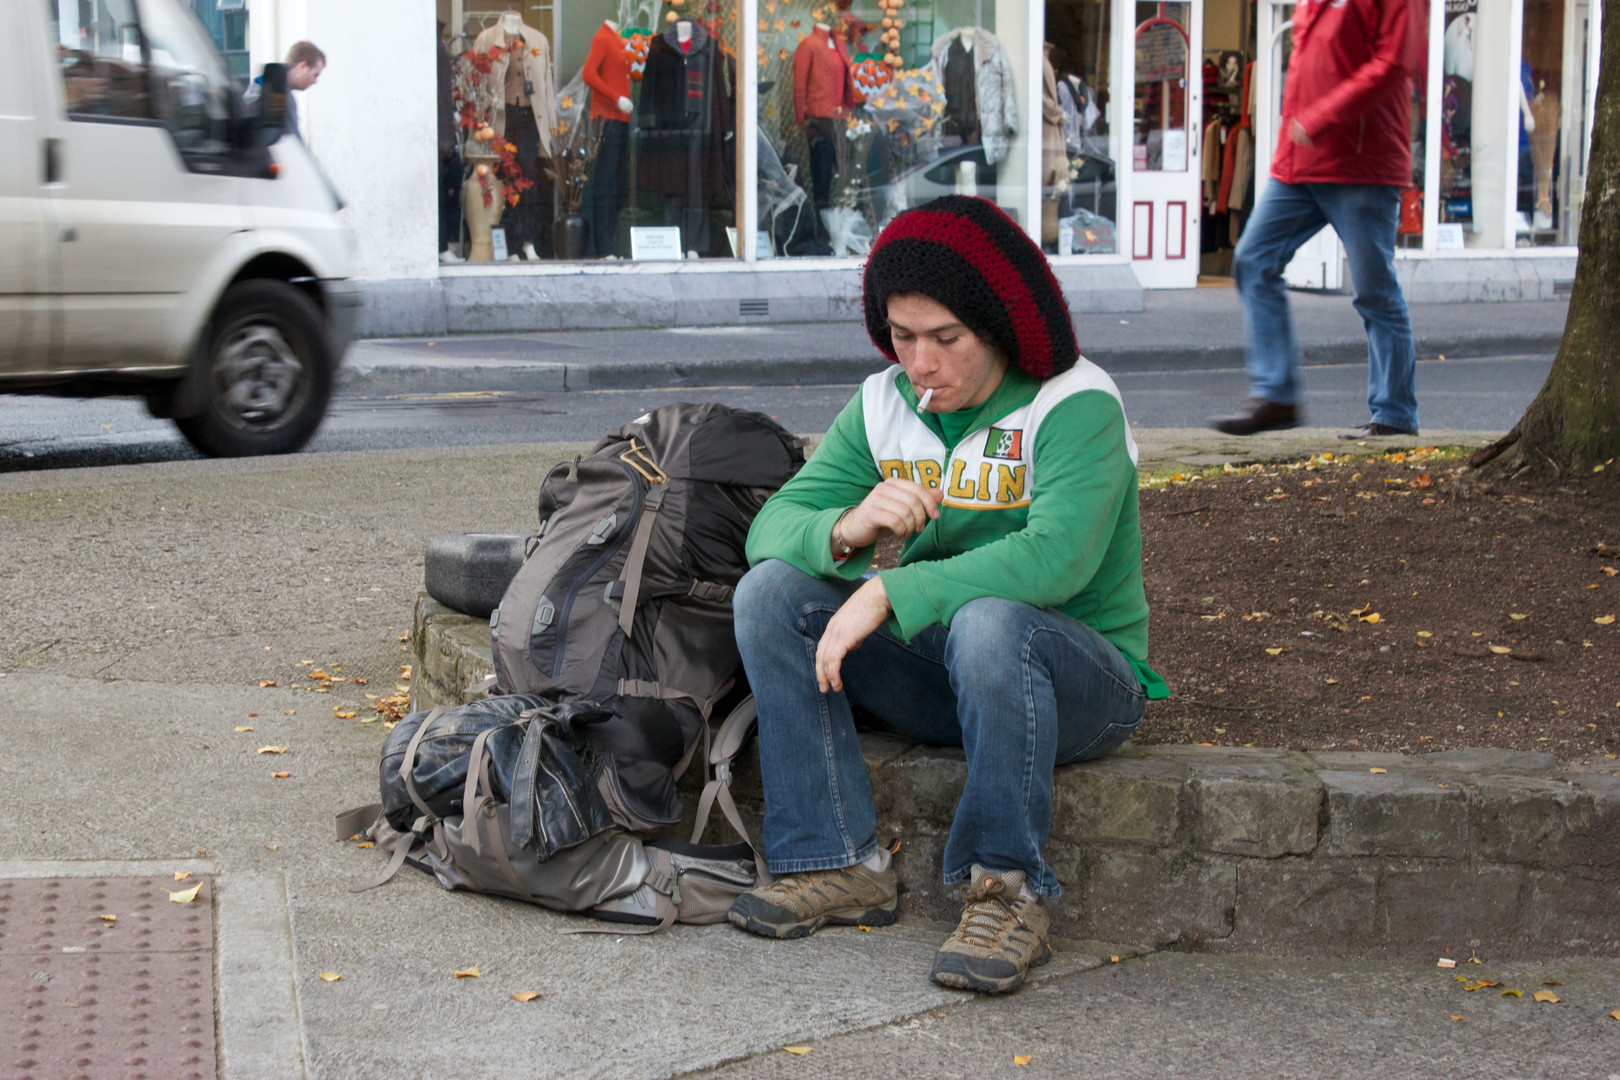 Sligo Ireland - Waiting